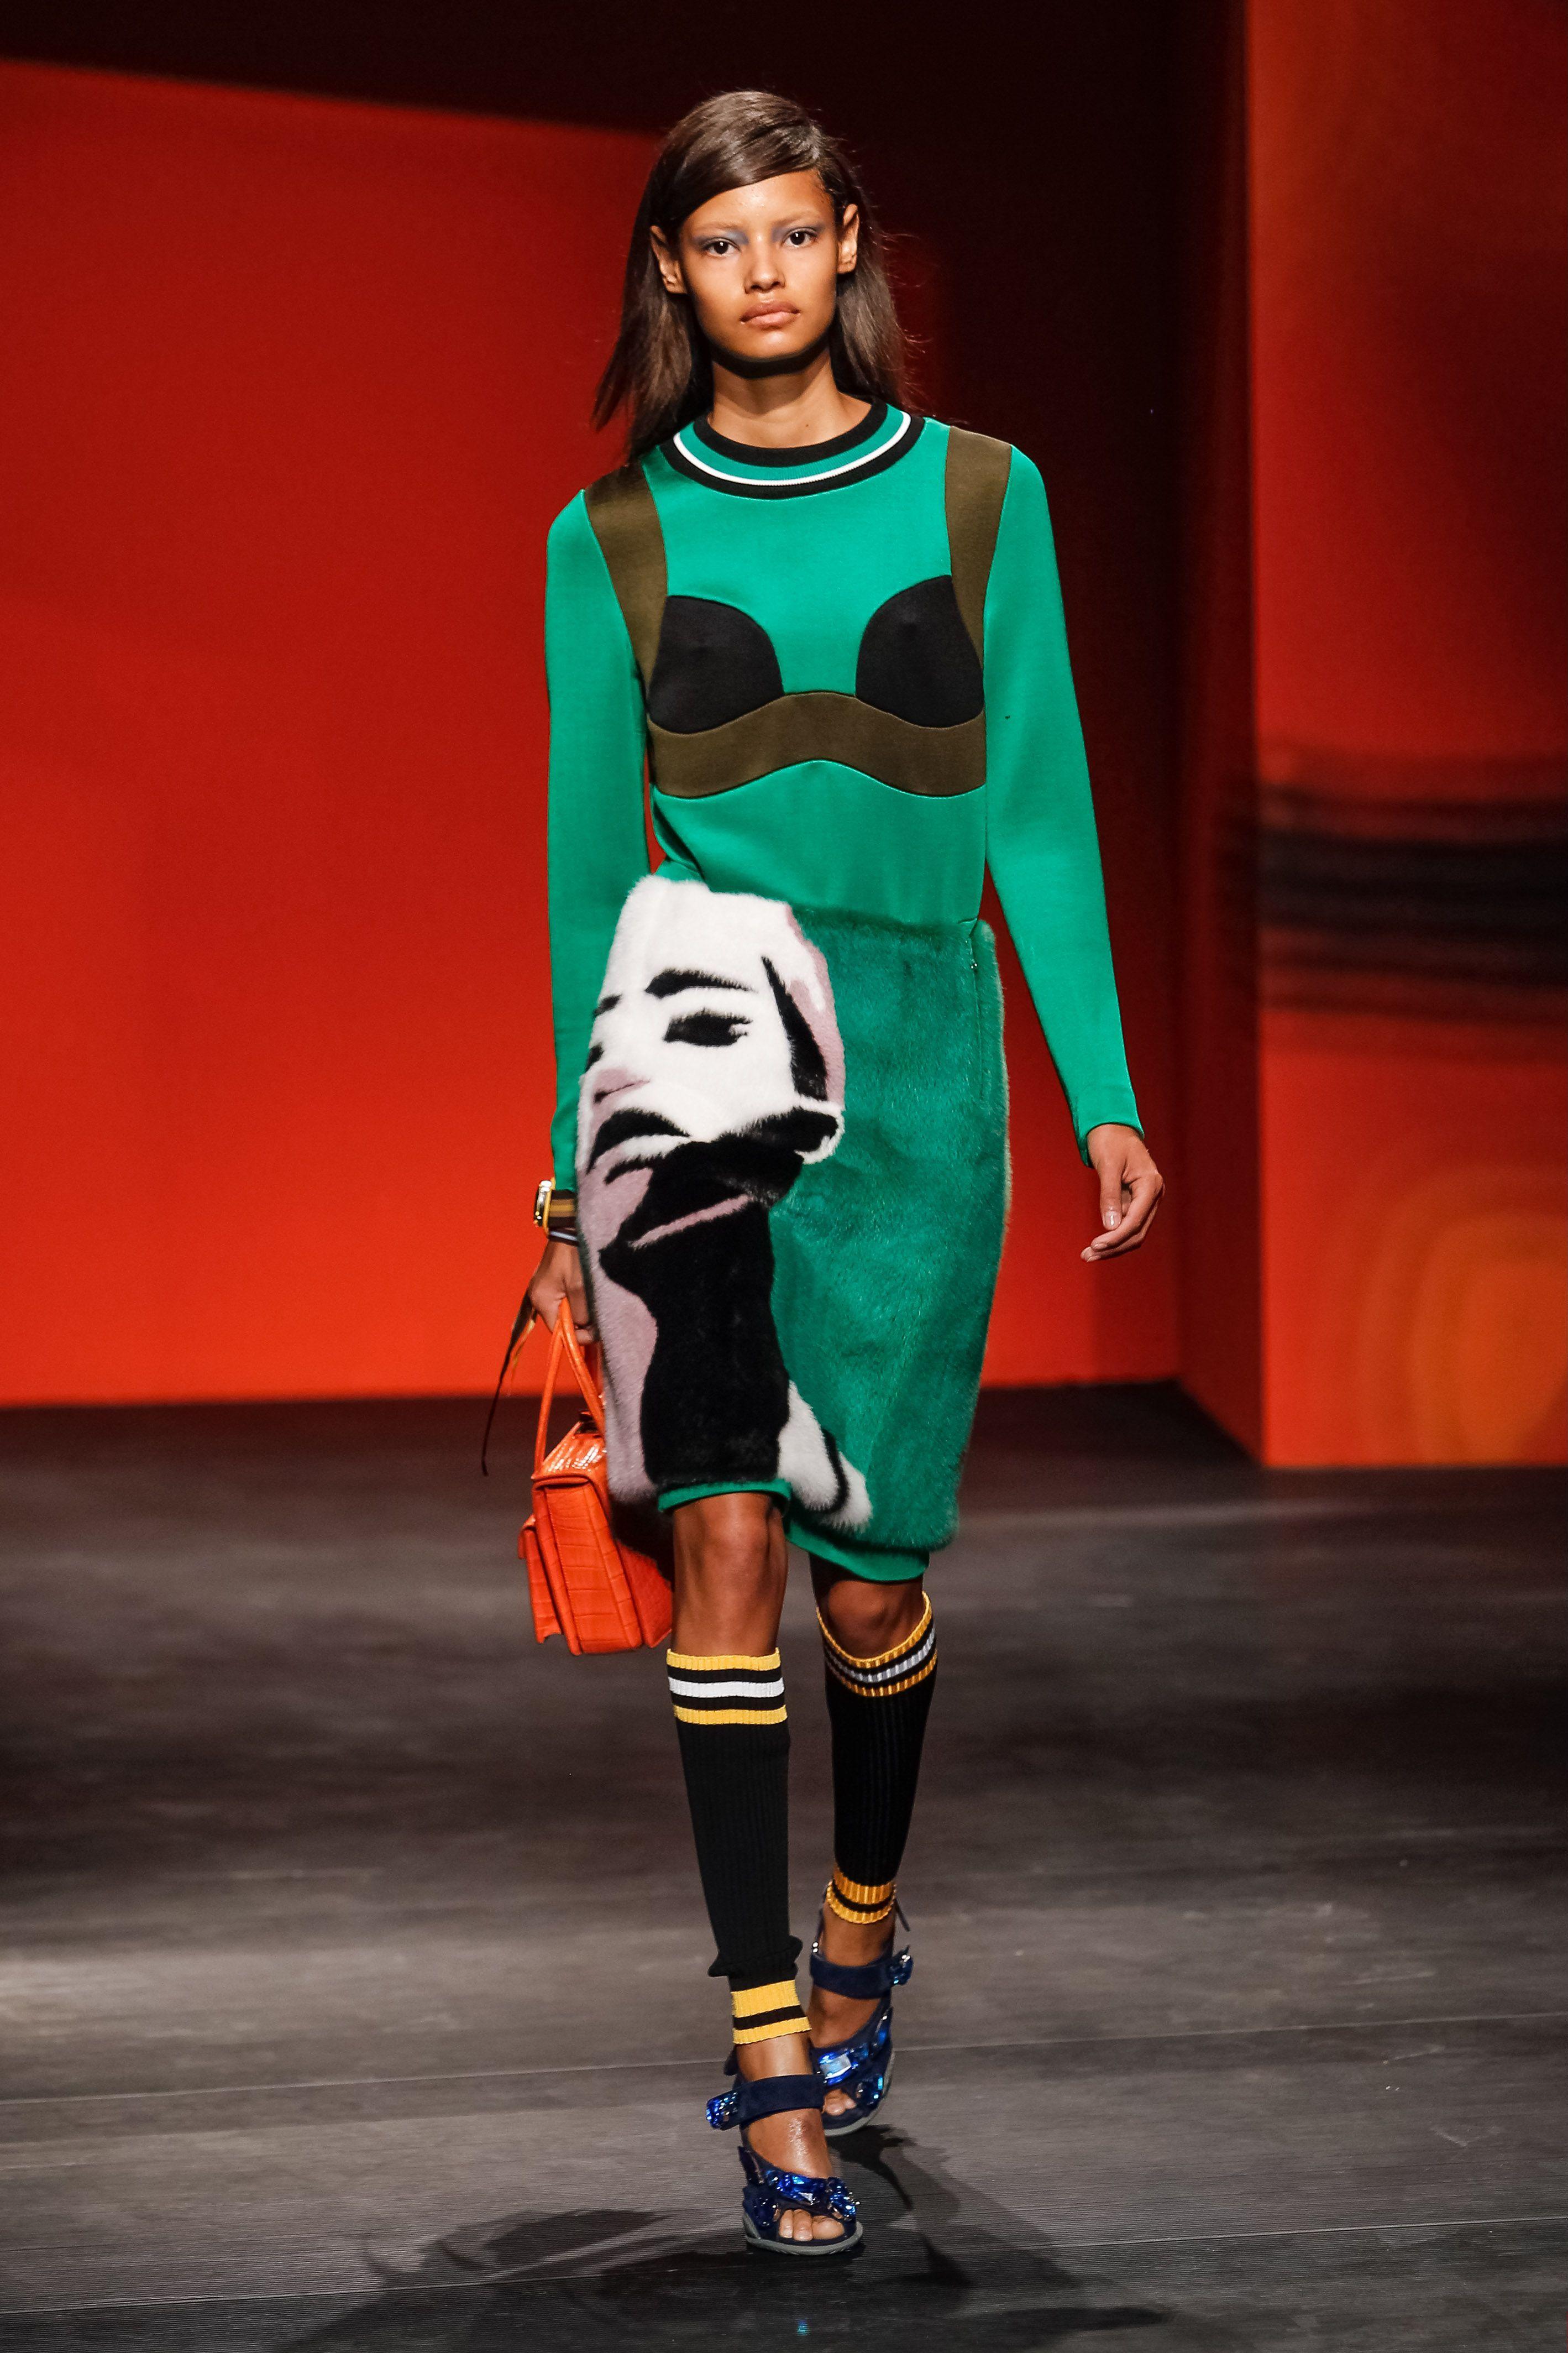 Milan Fashion Week Womenswear Spring/Summer 2014 - Prada - CatwalkWhere: Milan, ItalyWhen: 19 Sep 2013Credit: SIPA/WENN.com**Only available for publication in Germany. Not available for publication in the rest of the world.**